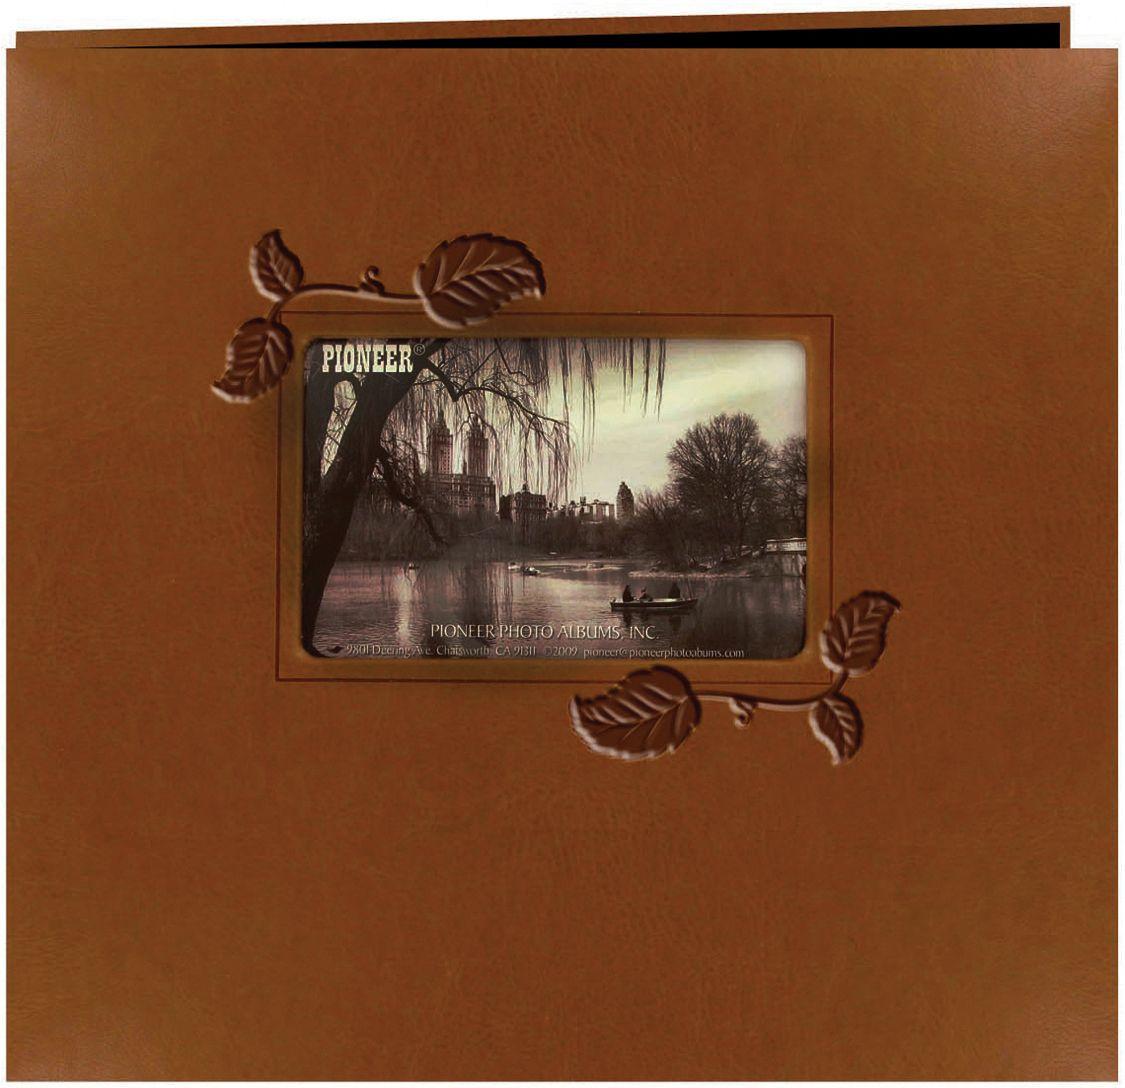 Pioneer Embossed Leatherette Framer Photo Album Leatherette Covers